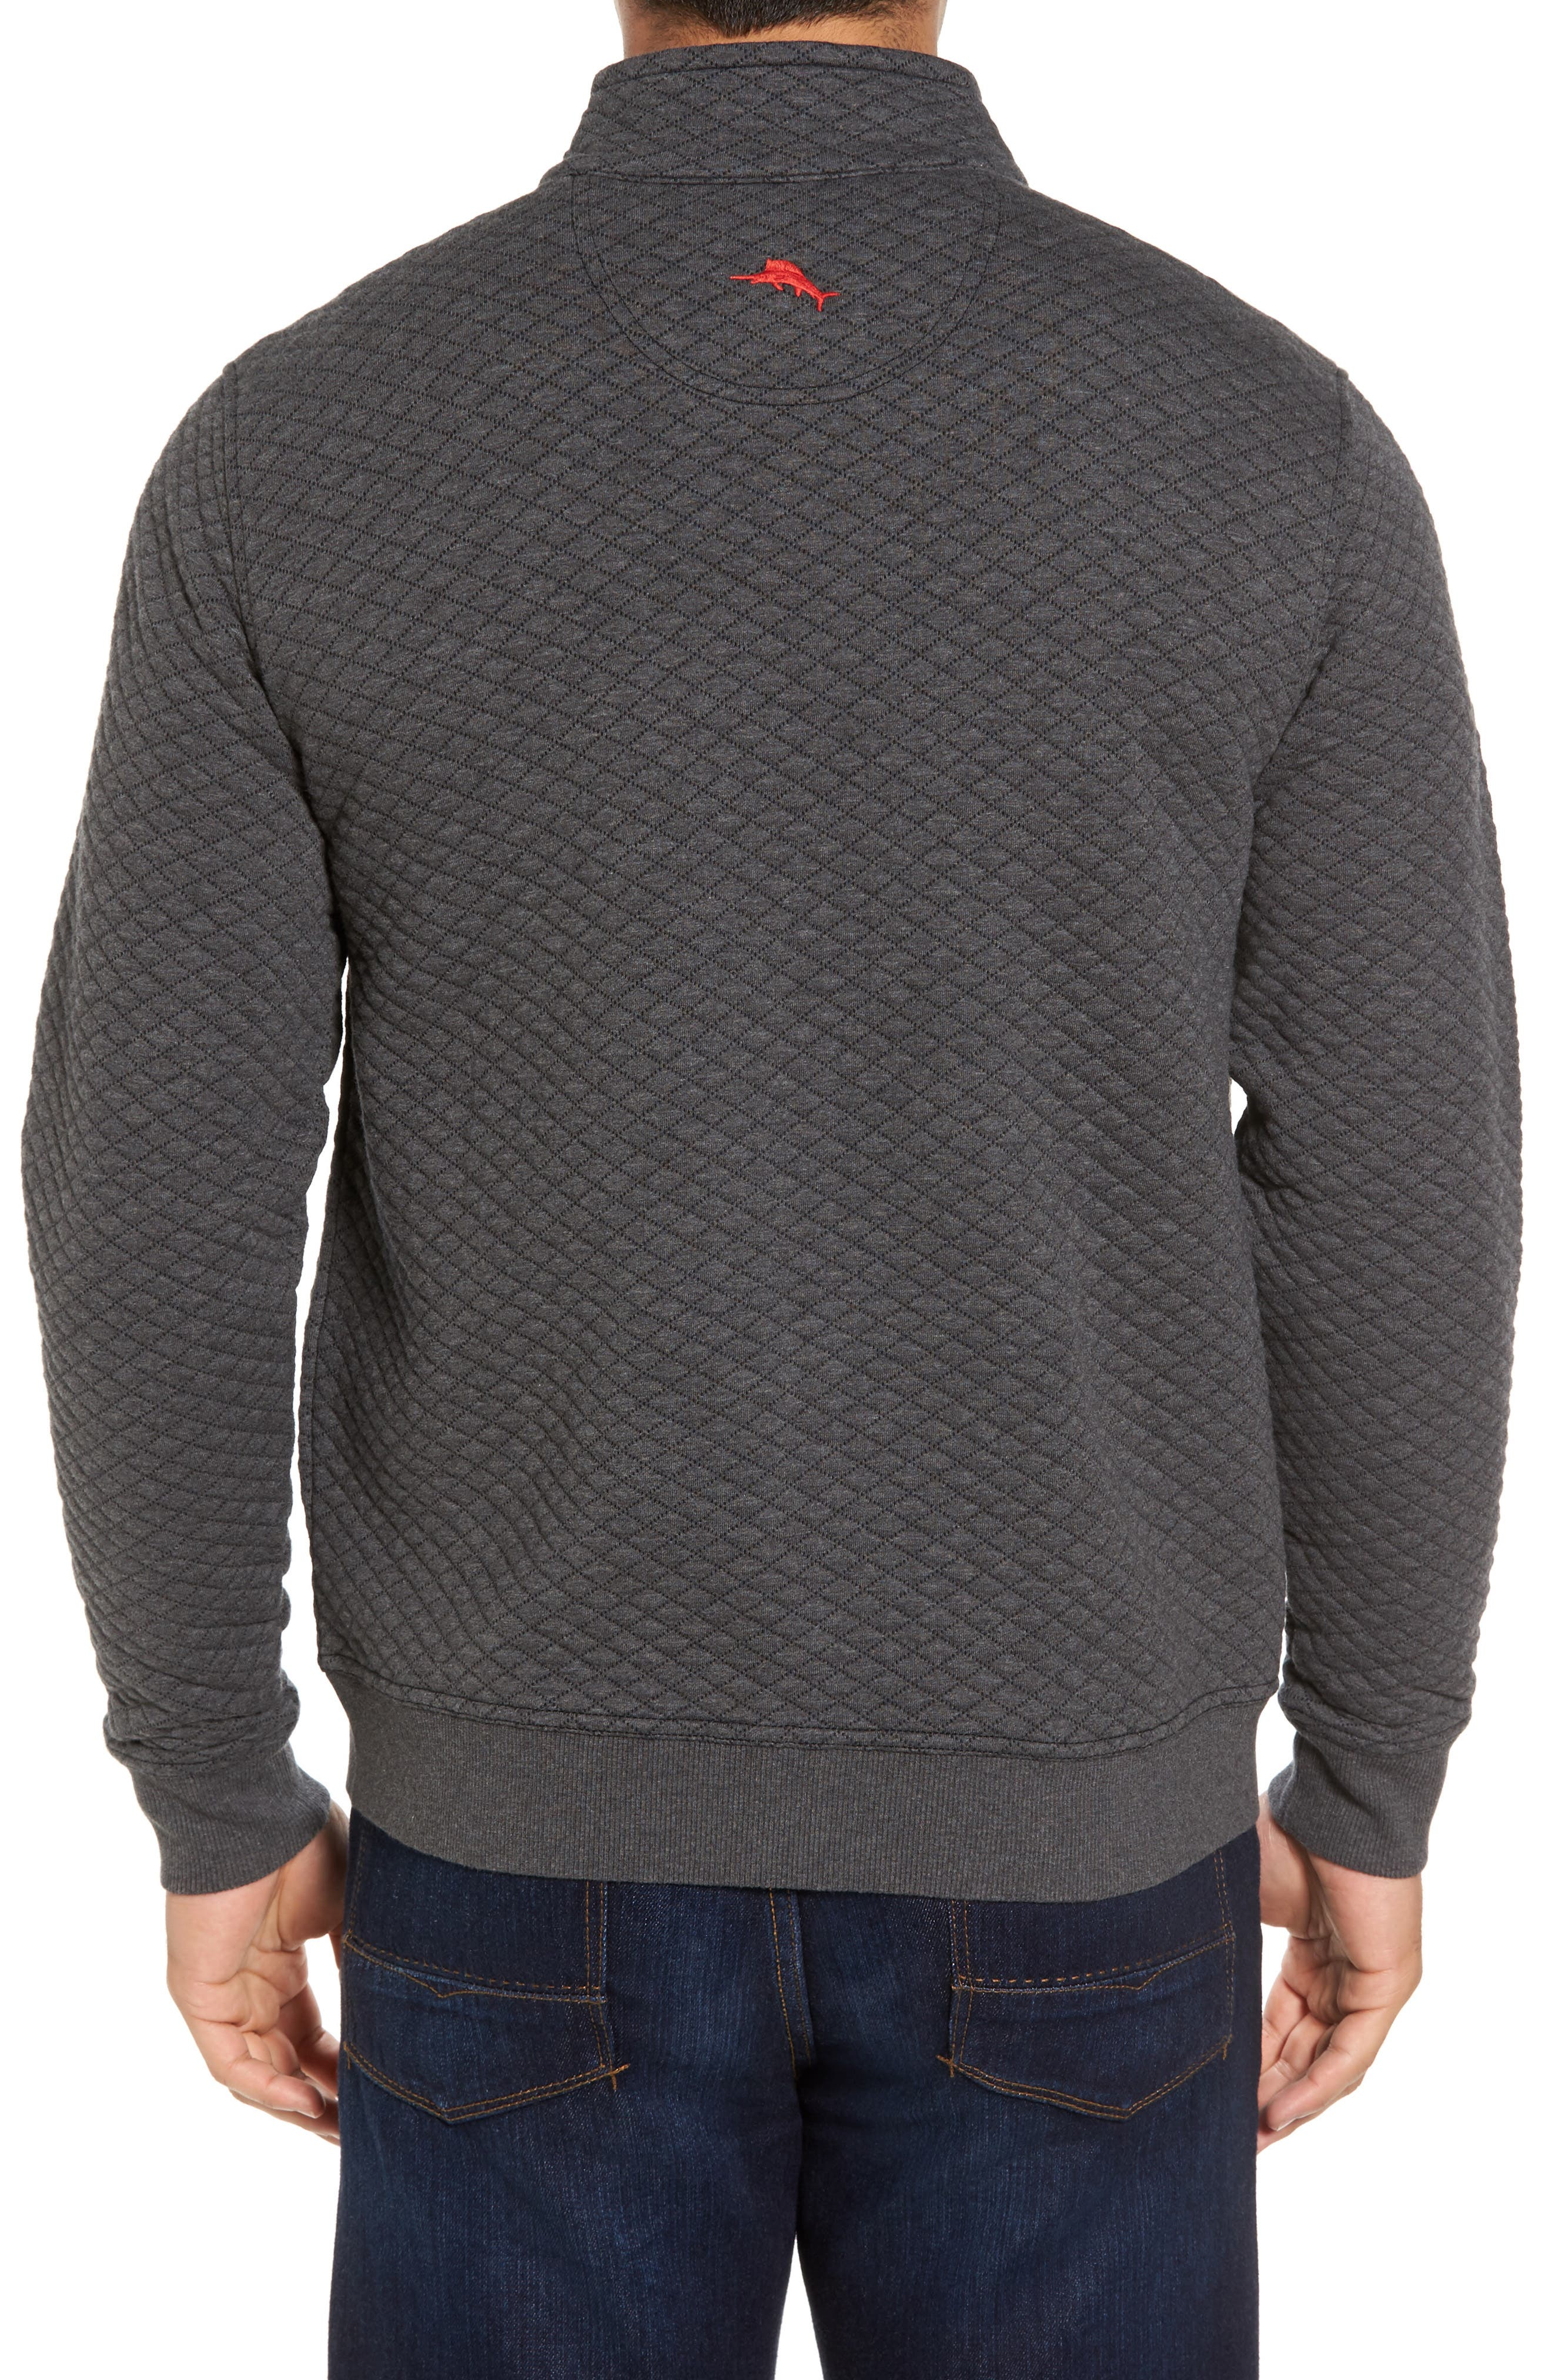 NFL Quiltessential Full Zip Sweatshirt,                             Alternate thumbnail 32, color,